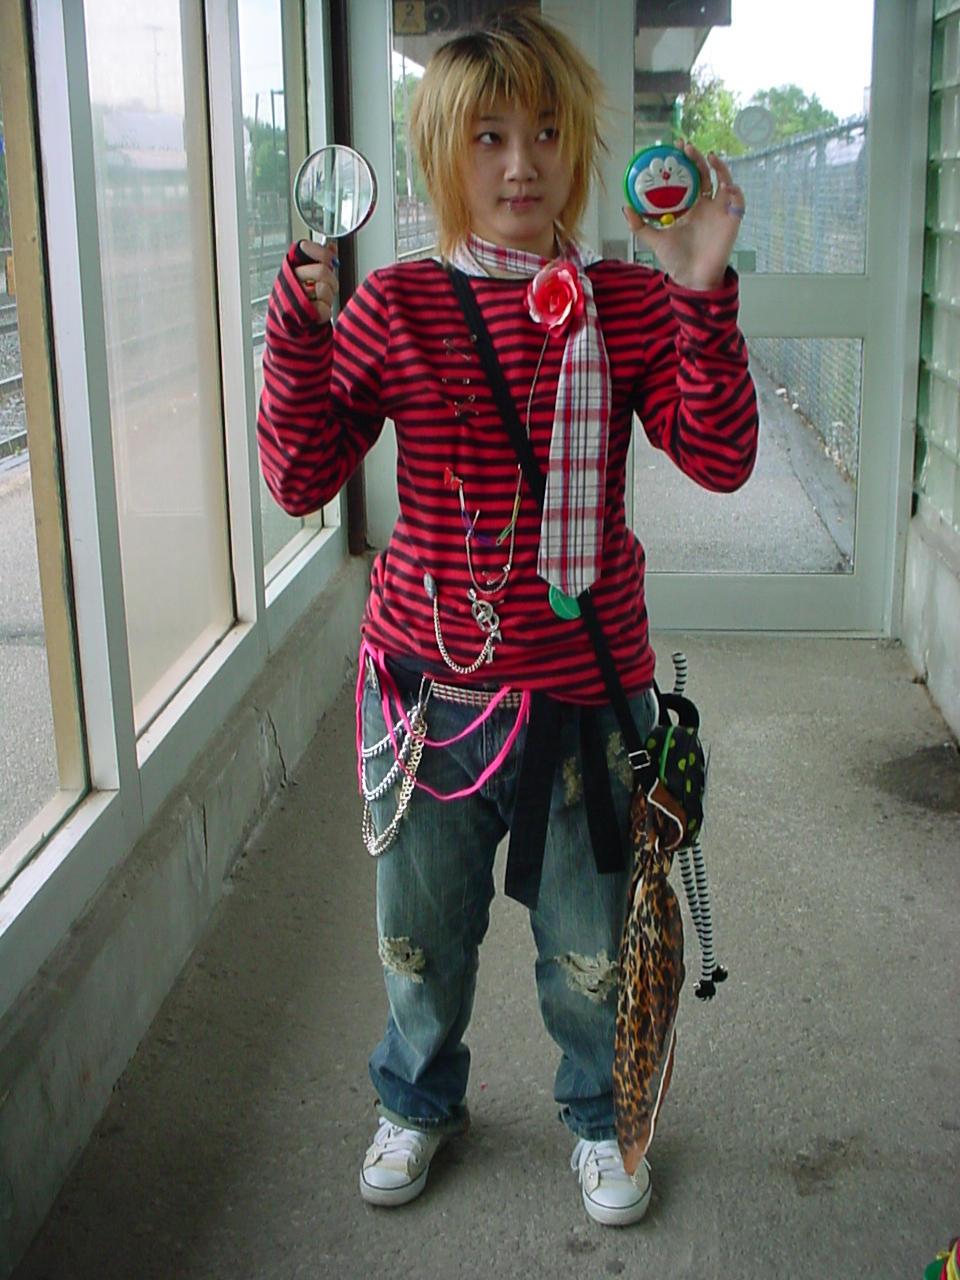 http://fc00.deviantart.com/fs12/i/2006/269/7/6/Street_Fashion_Whoot_by_shycosplay.jpg